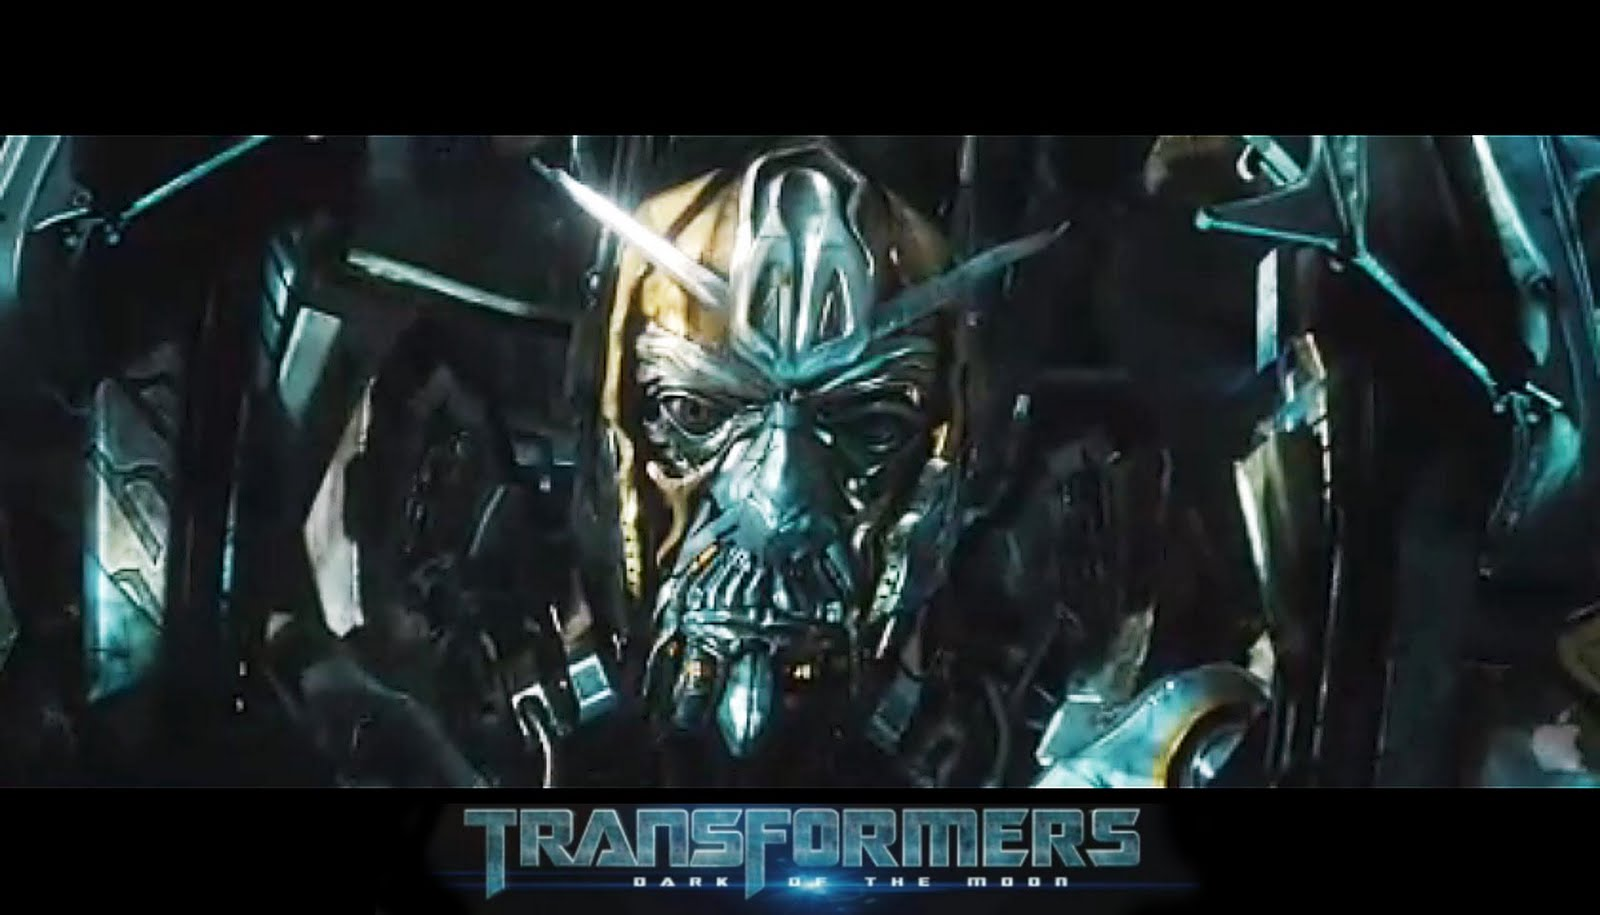 http://2.bp.blogspot.com/-LdHUJJ_G6Rk/Tf-YtPq5e4I/AAAAAAAAAbA/WyBn17M9E7Y/s1600/Transformers_3.jpg